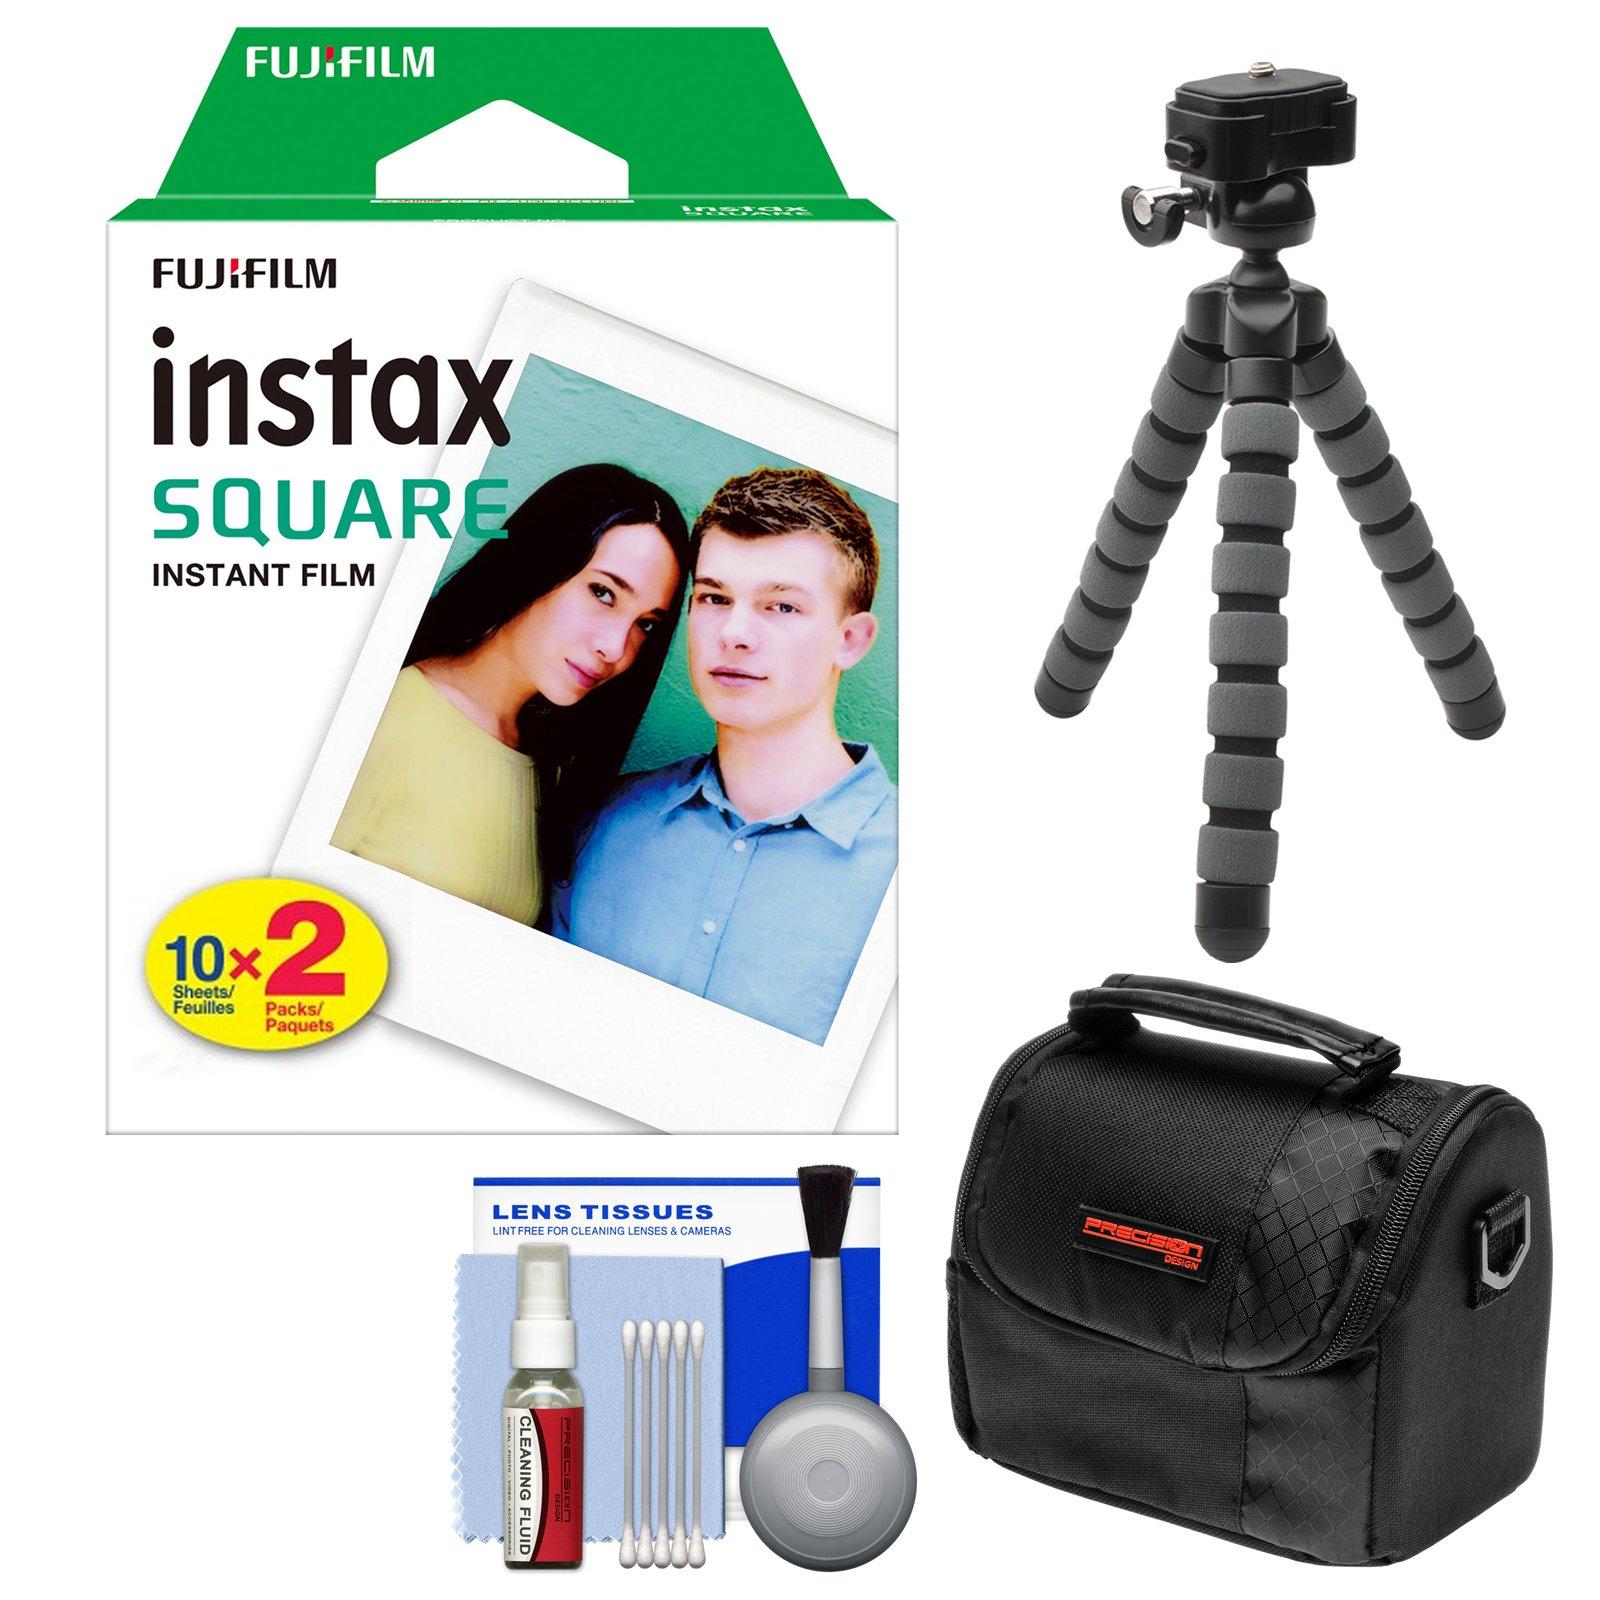 Fujifilm Instax WW1 Square Twin Instant Film (20 Color Prints) with Case + Tripod + Kit for SQ6 & SQ10 Cameras